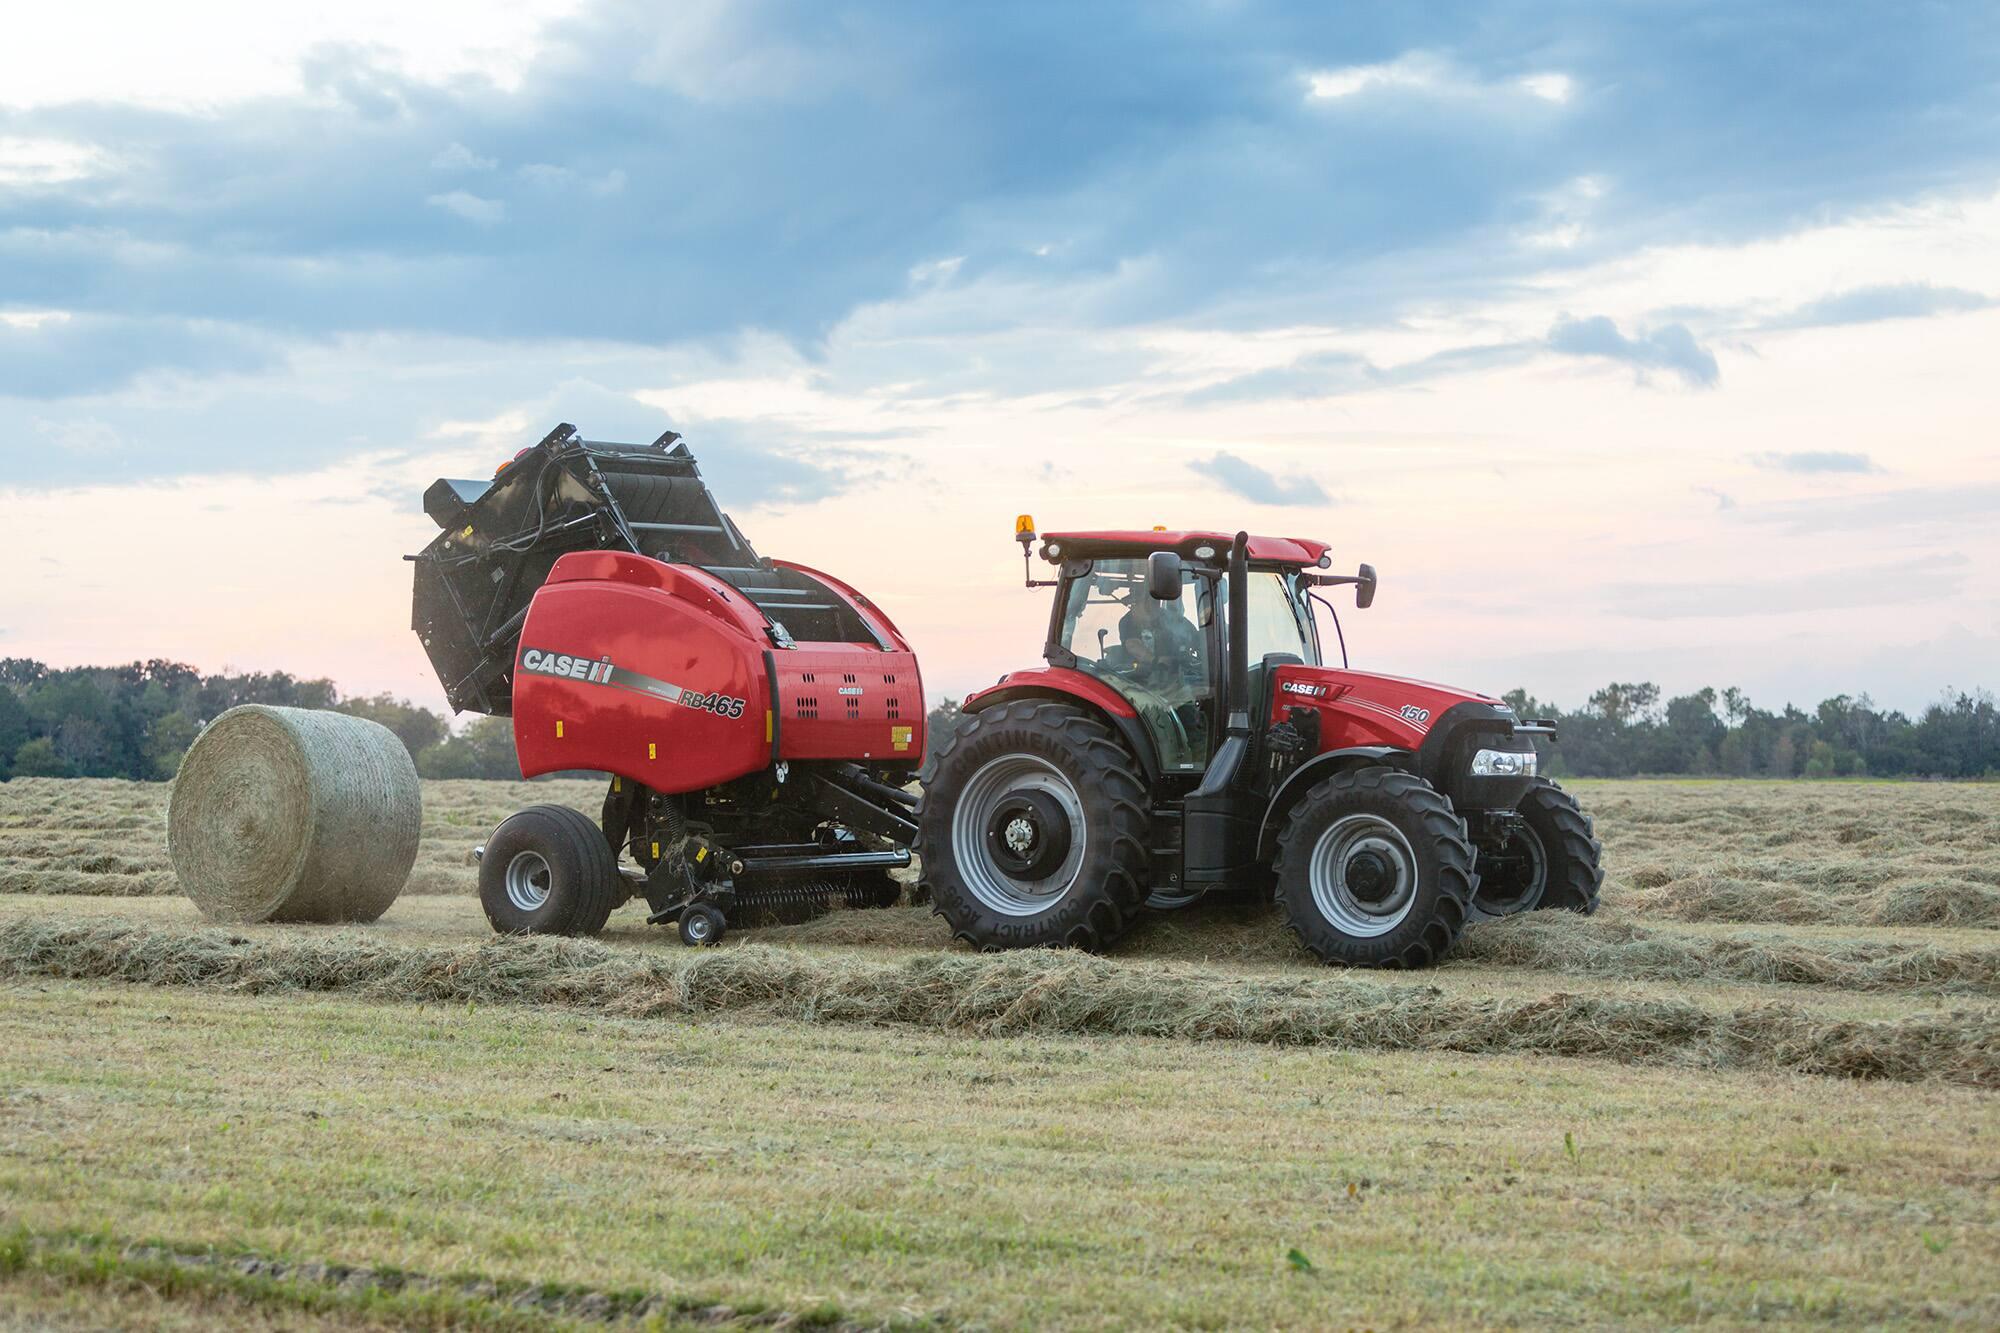 maxxum 150 4 wheel drive multipurpose tractors case ih rh caseih com New Case IH Tractor New Case IH Tractor